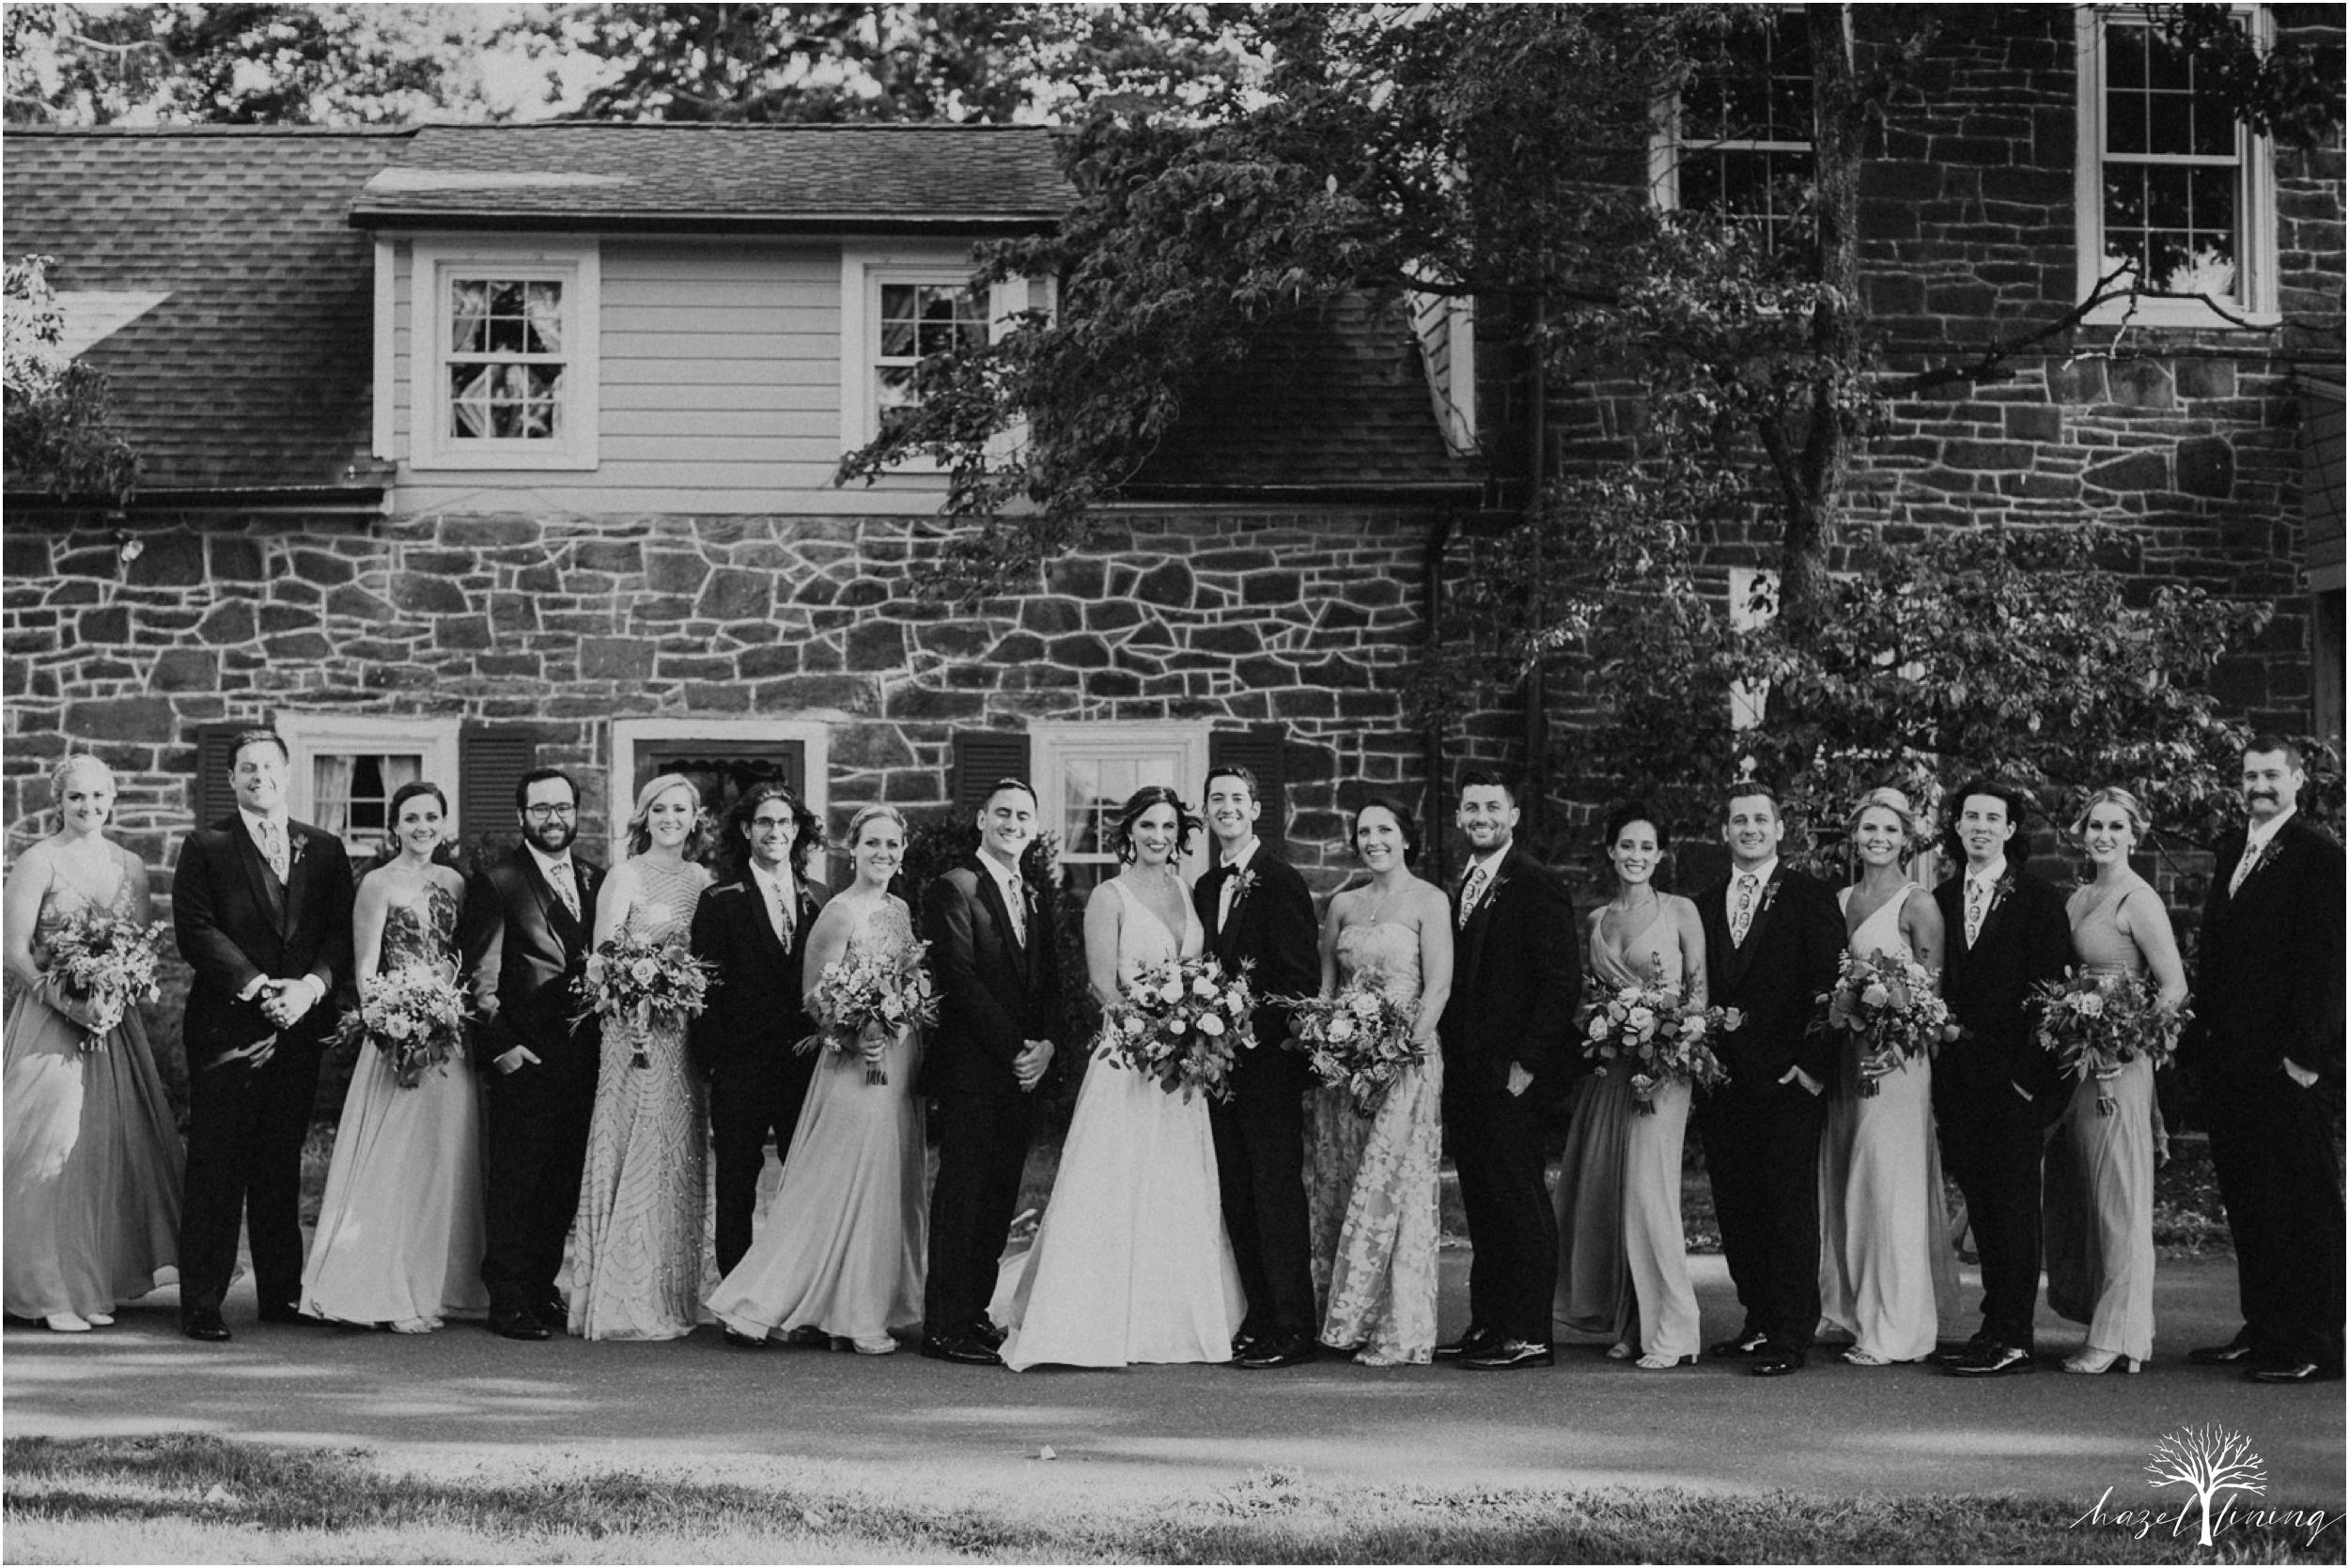 maureen-hepner-anthony-giordano-rose-bank-winery-newtow-pennsylvania-luxury-summer-wedding-hazel-lining-photography-destination-elopement-wedding-engagement-photography_0086.jpg